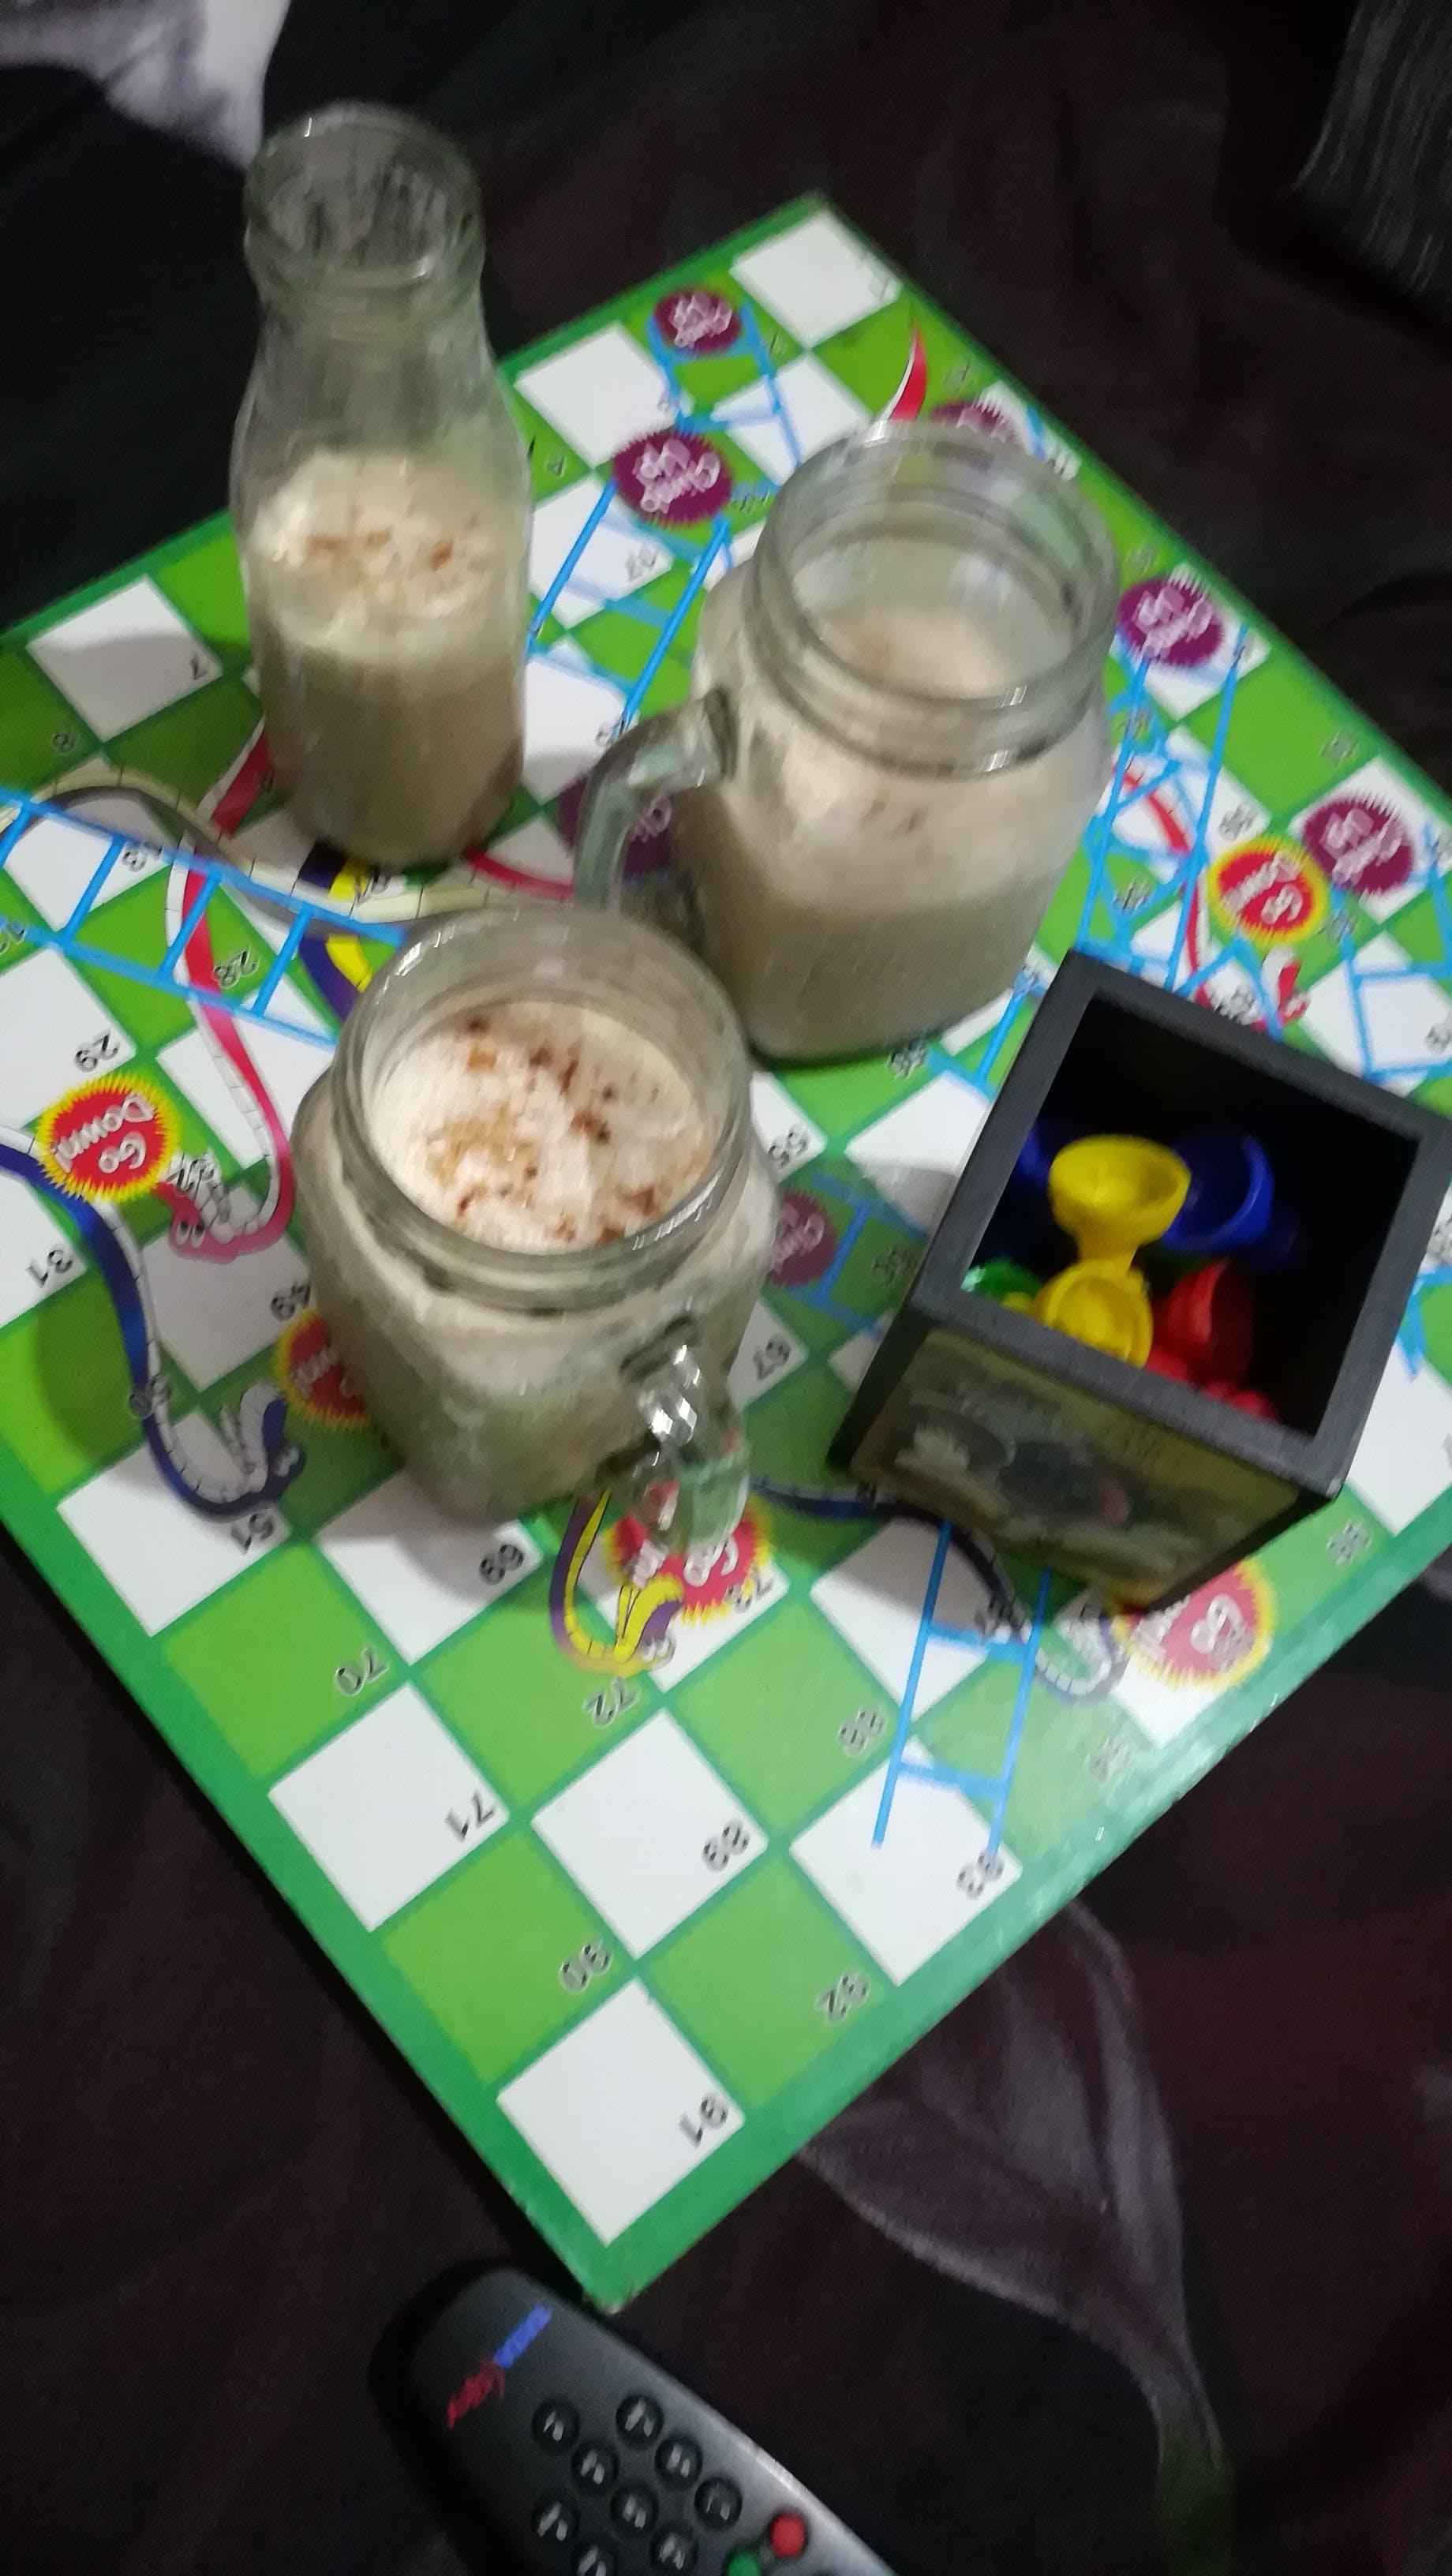 Free stock photo of coffee, food, game